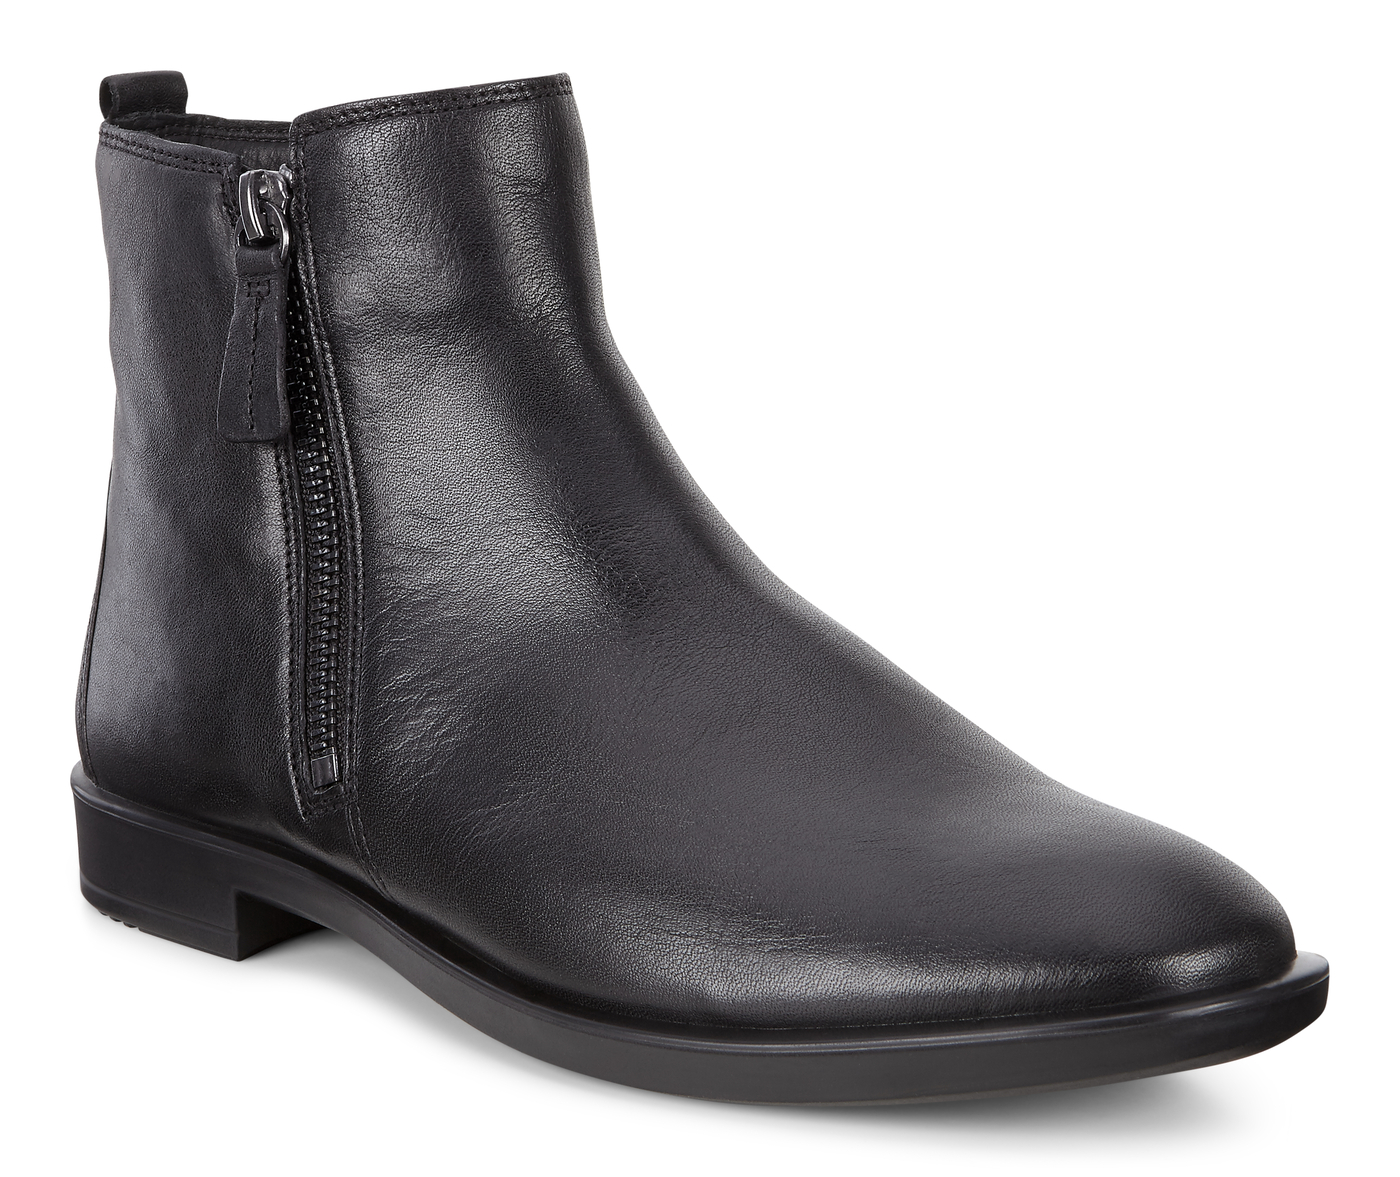 ECCO SHAPE M Side Zip Chelsea Boot 15mm